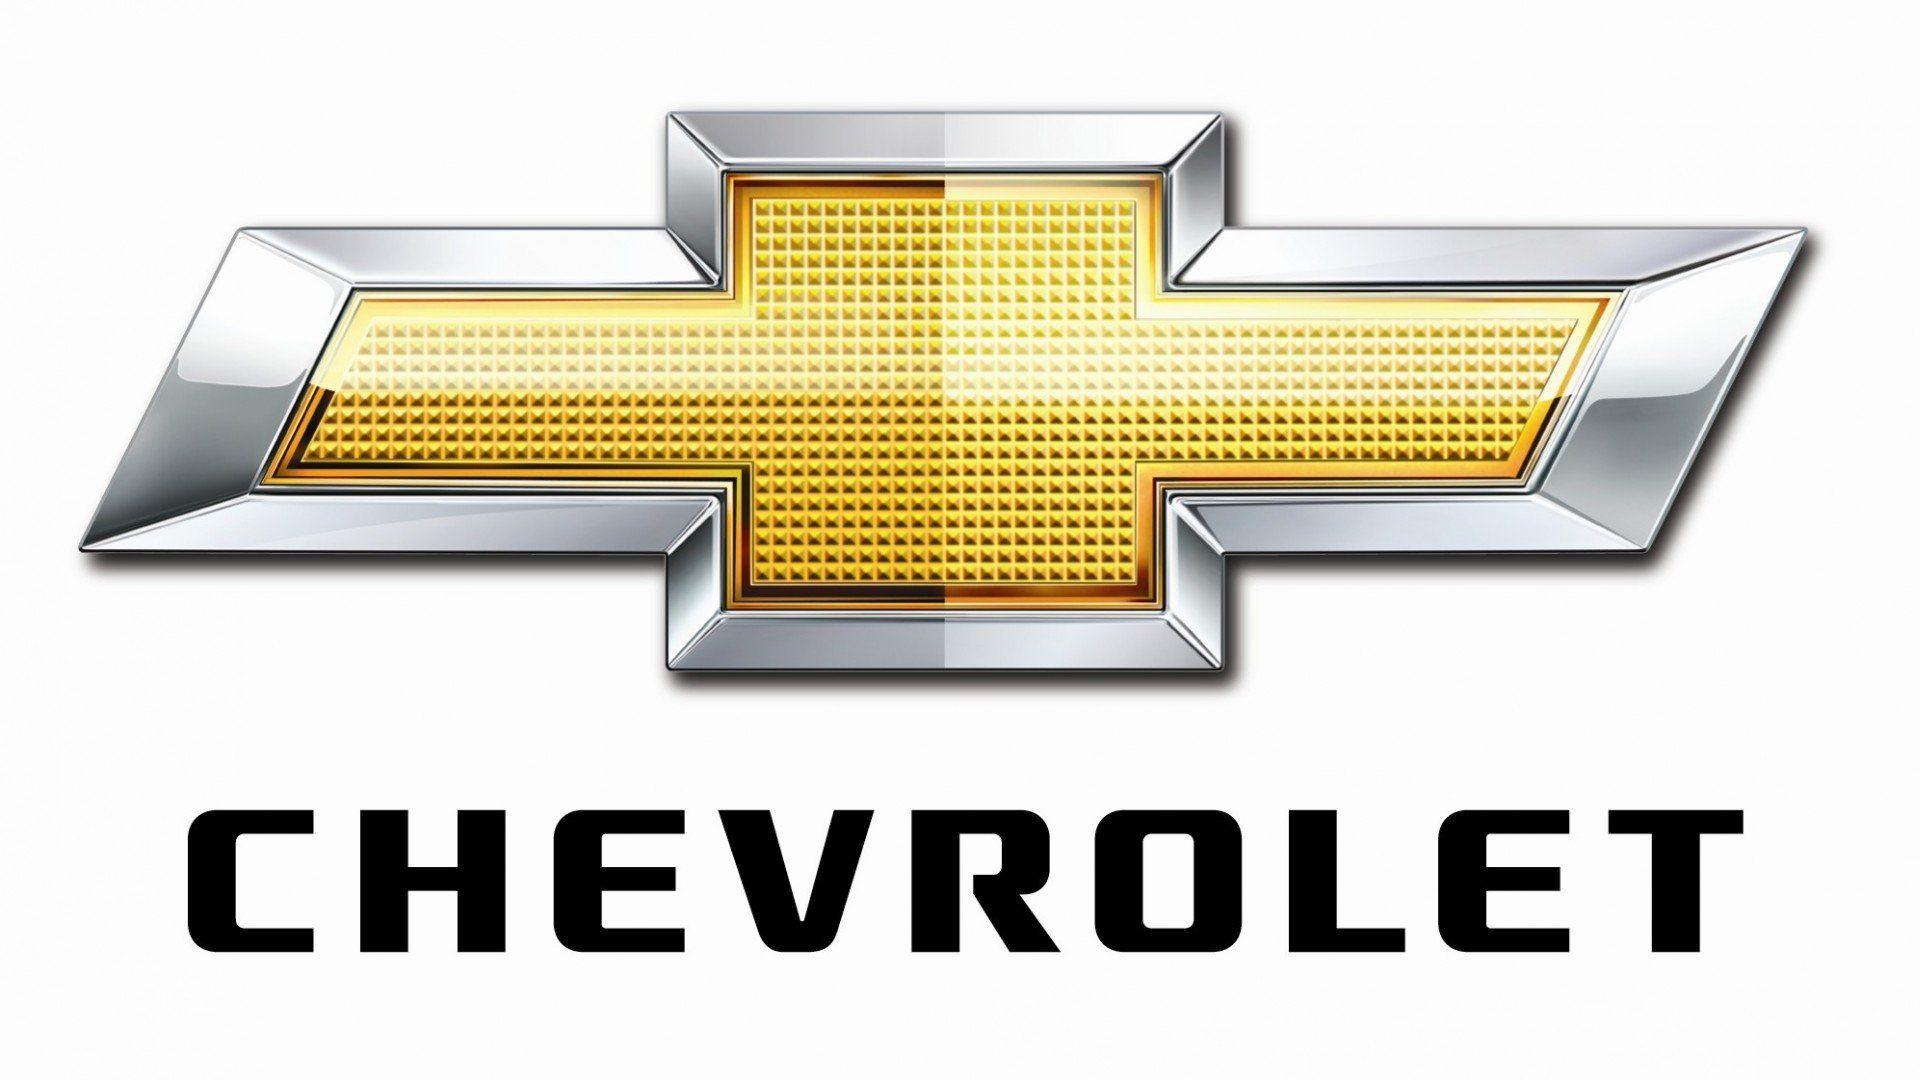 Logo Chevrolet, Chevrolet paiement, Chevrolet partenaire CS Paiement